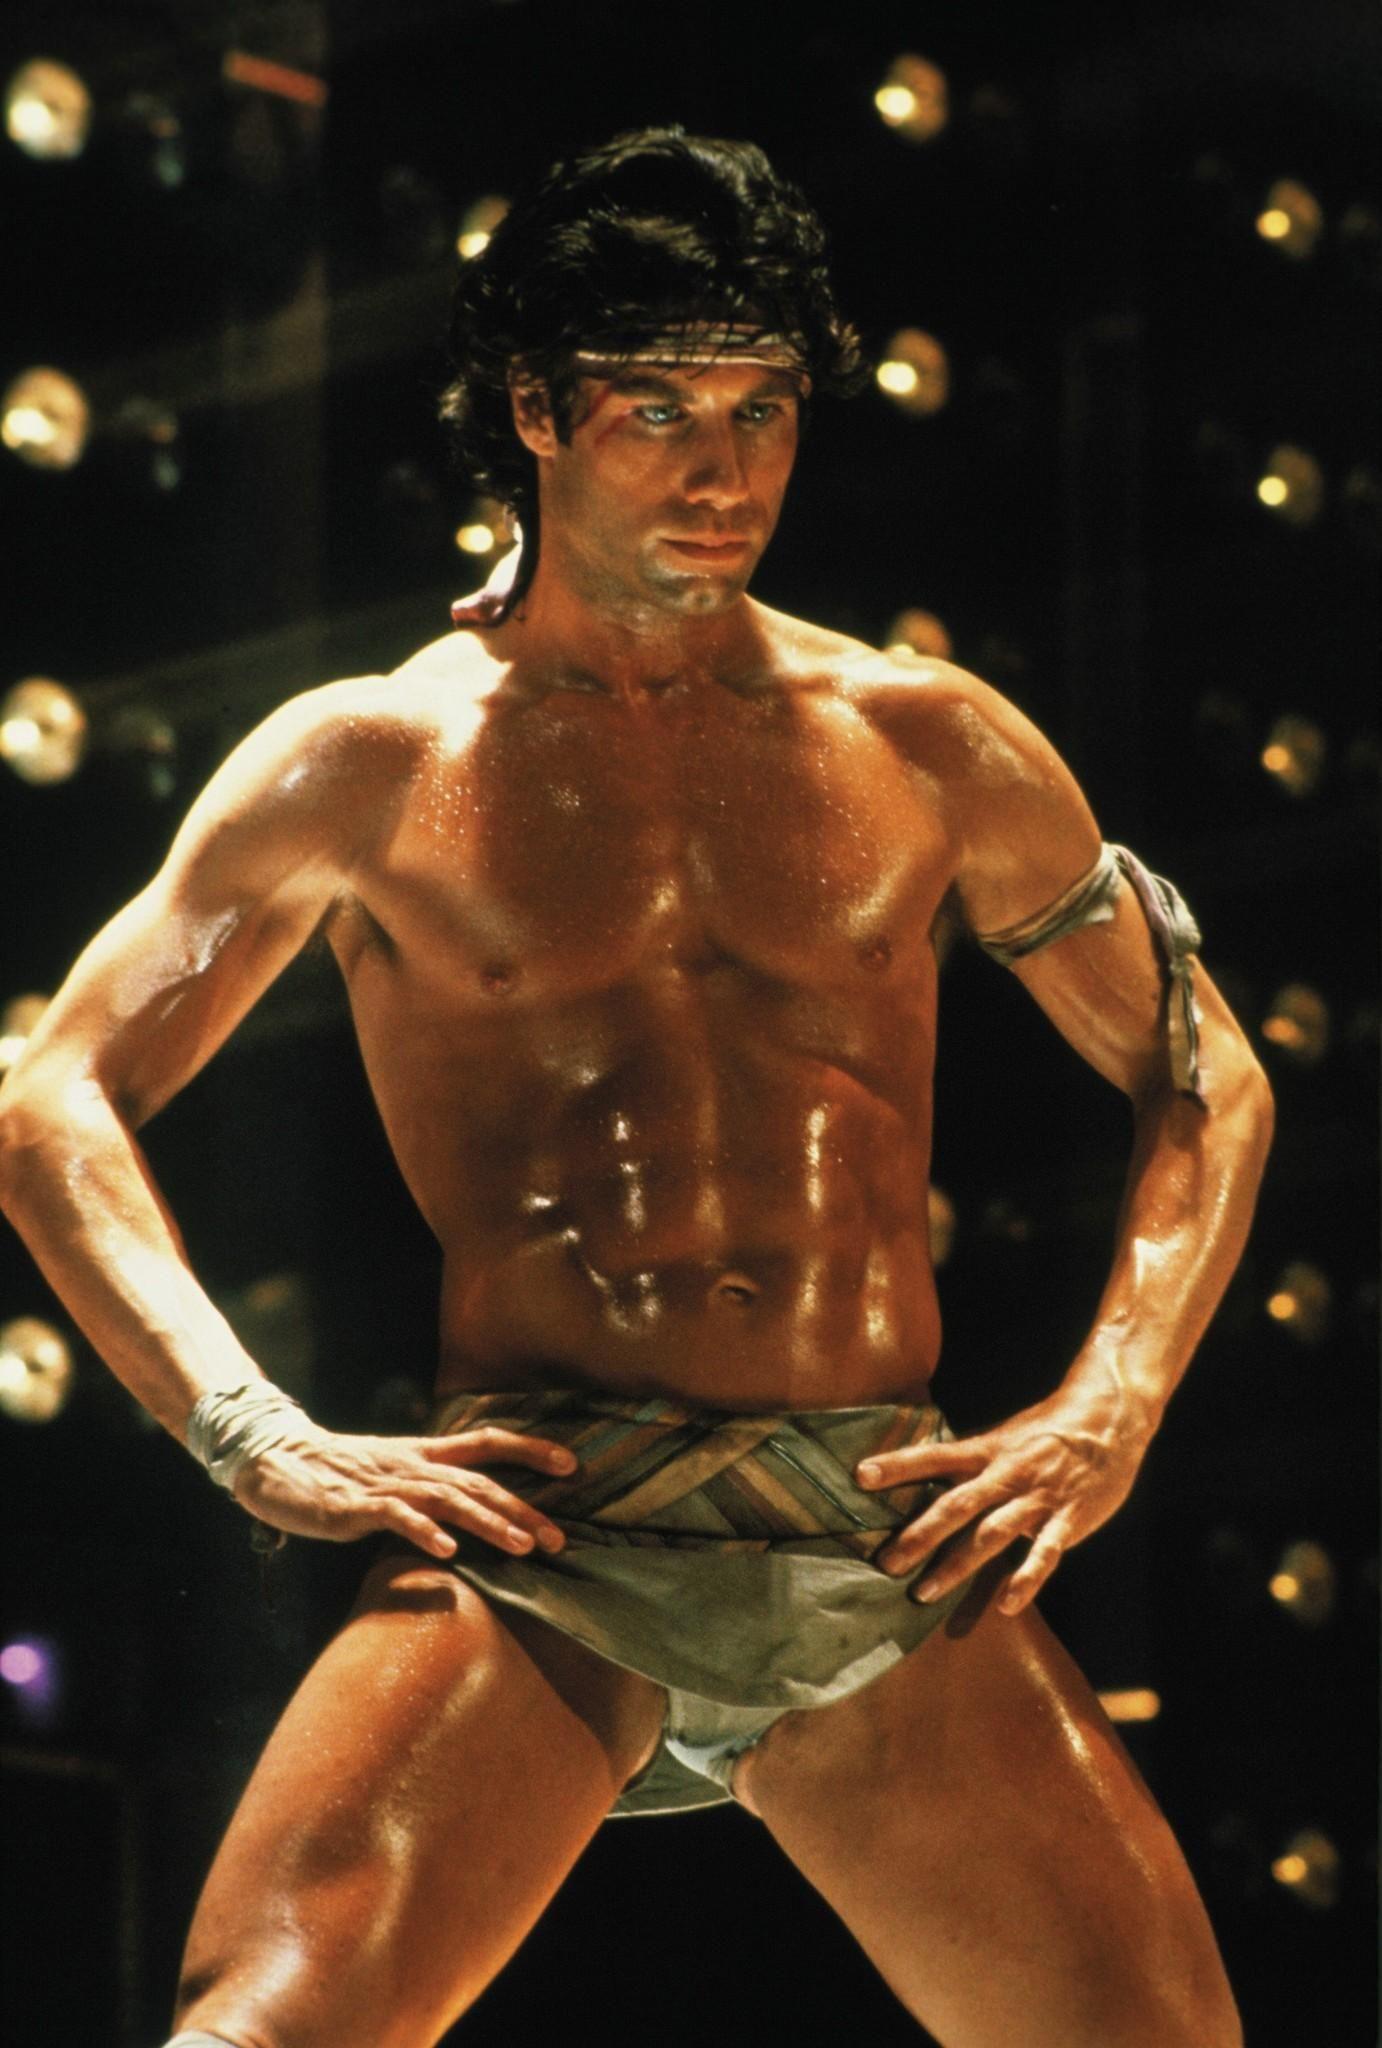 John Travolta In The Staying Alive Movie Eye Candy John